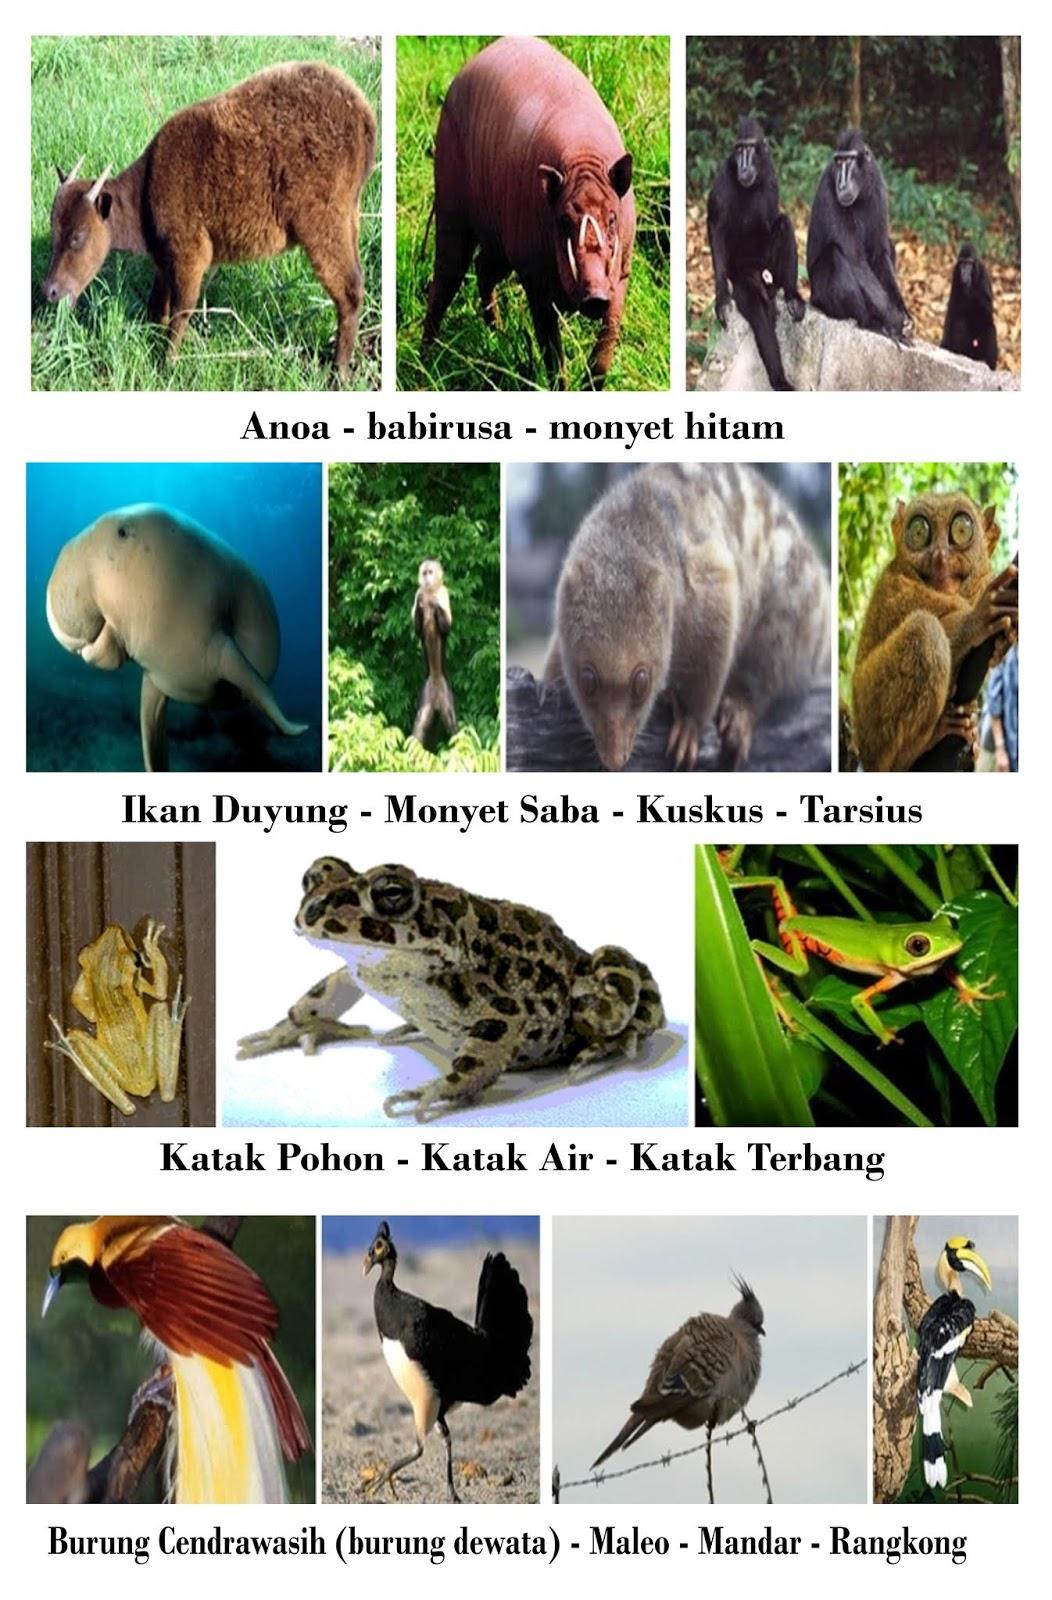 Contoh Fauna Peralihan : contoh, fauna, peralihan, Gambar, Fauna, Peralihan